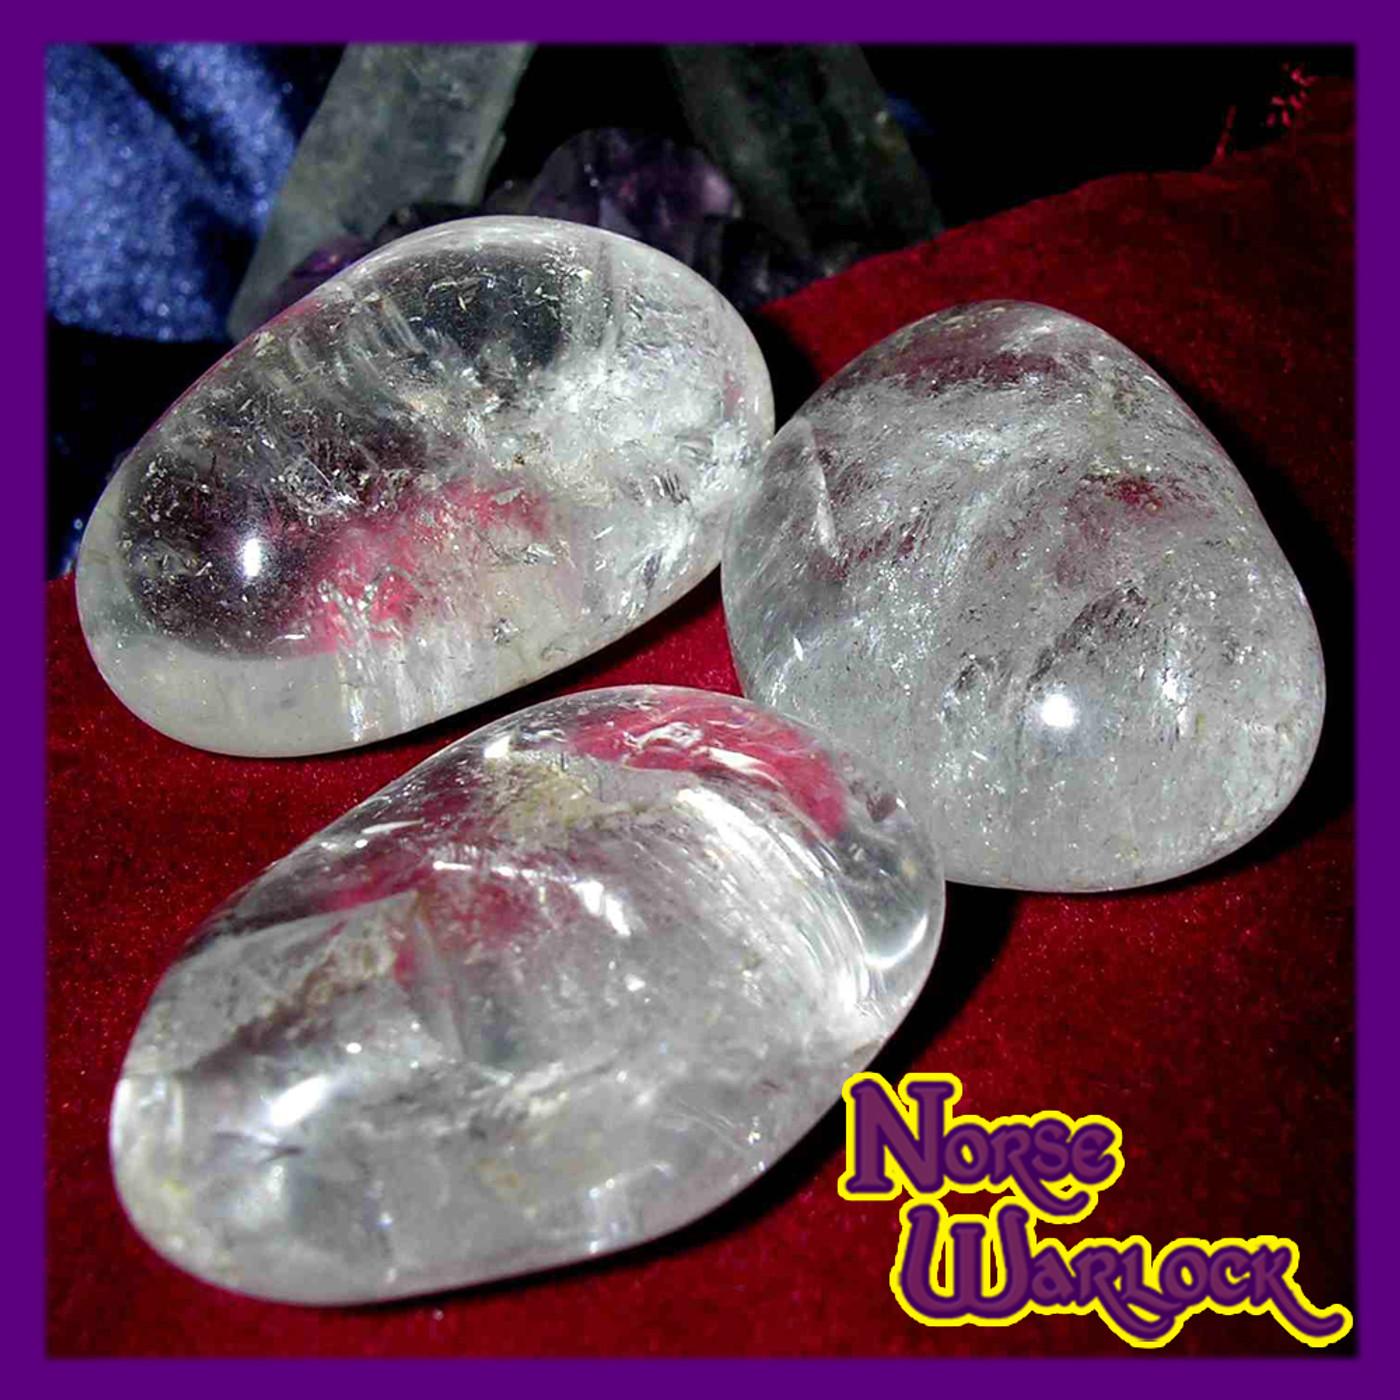 3 Metaphysical Quartz Healing Crystals